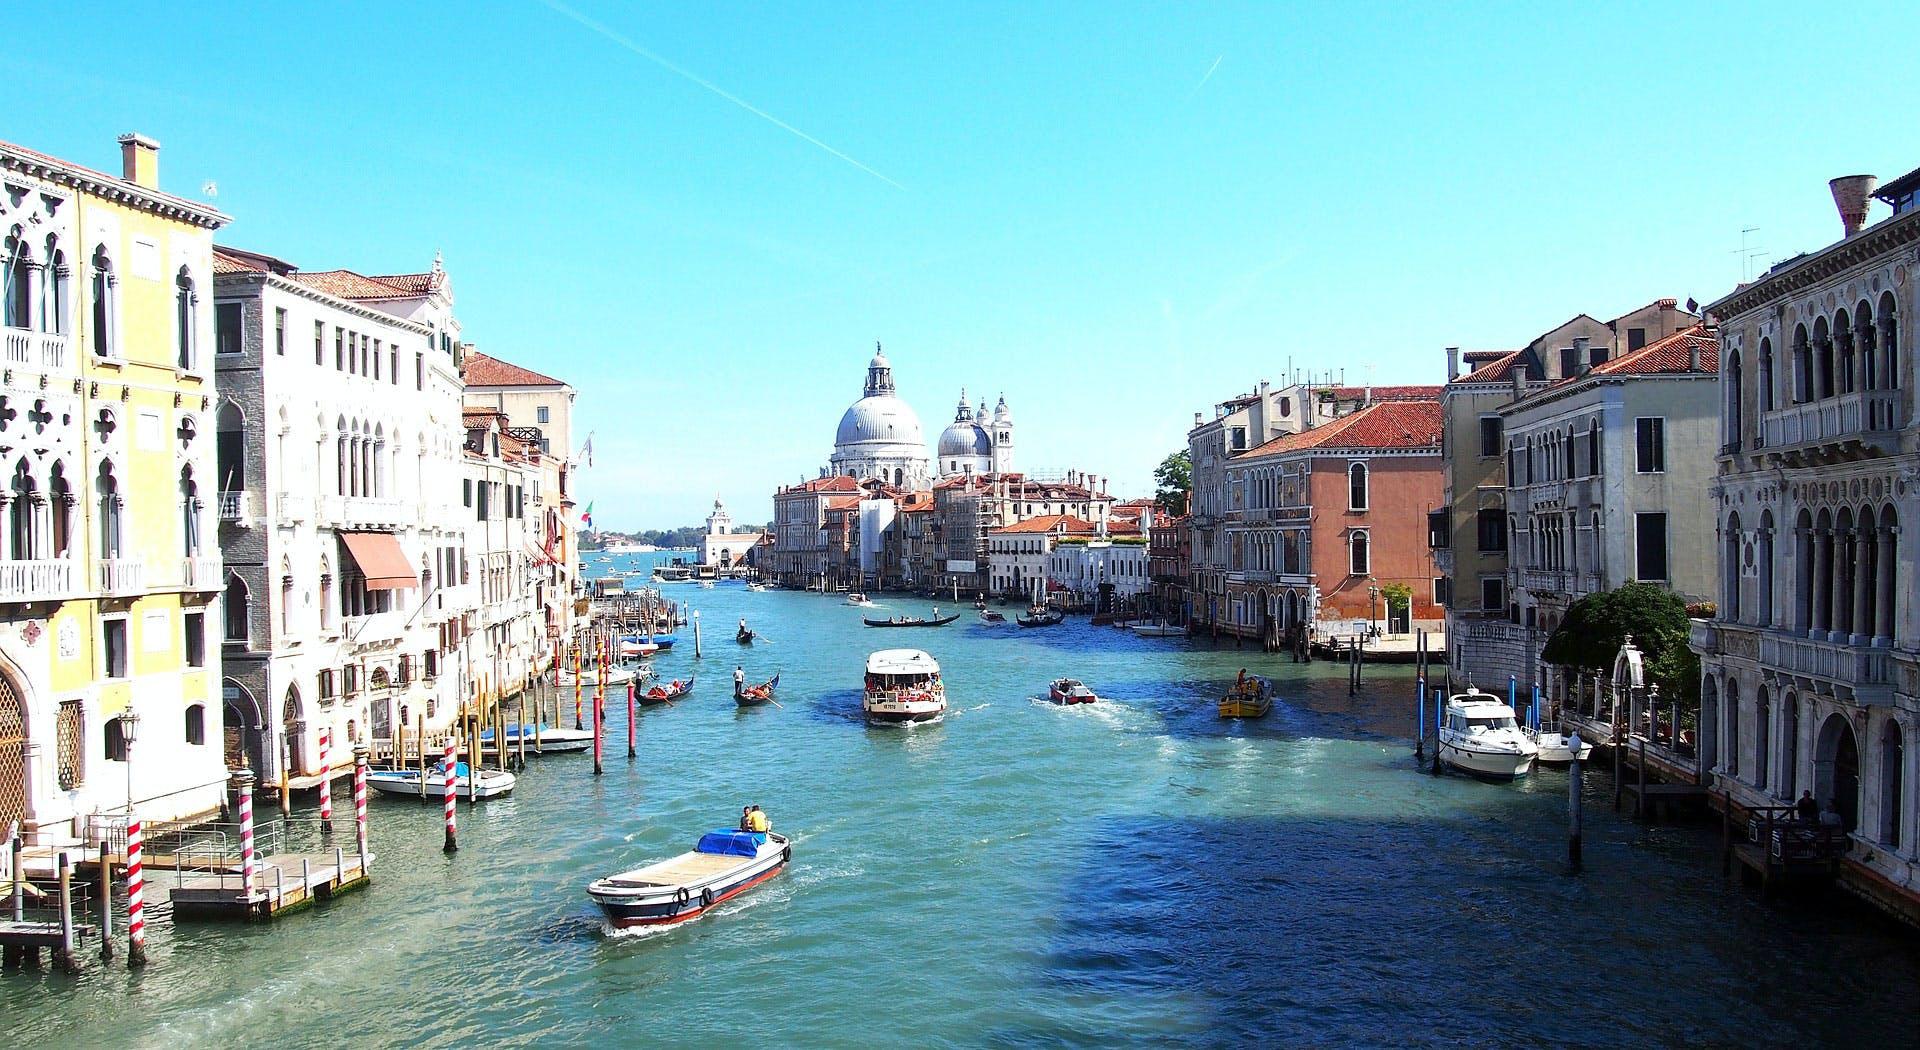 Venice: how lovely